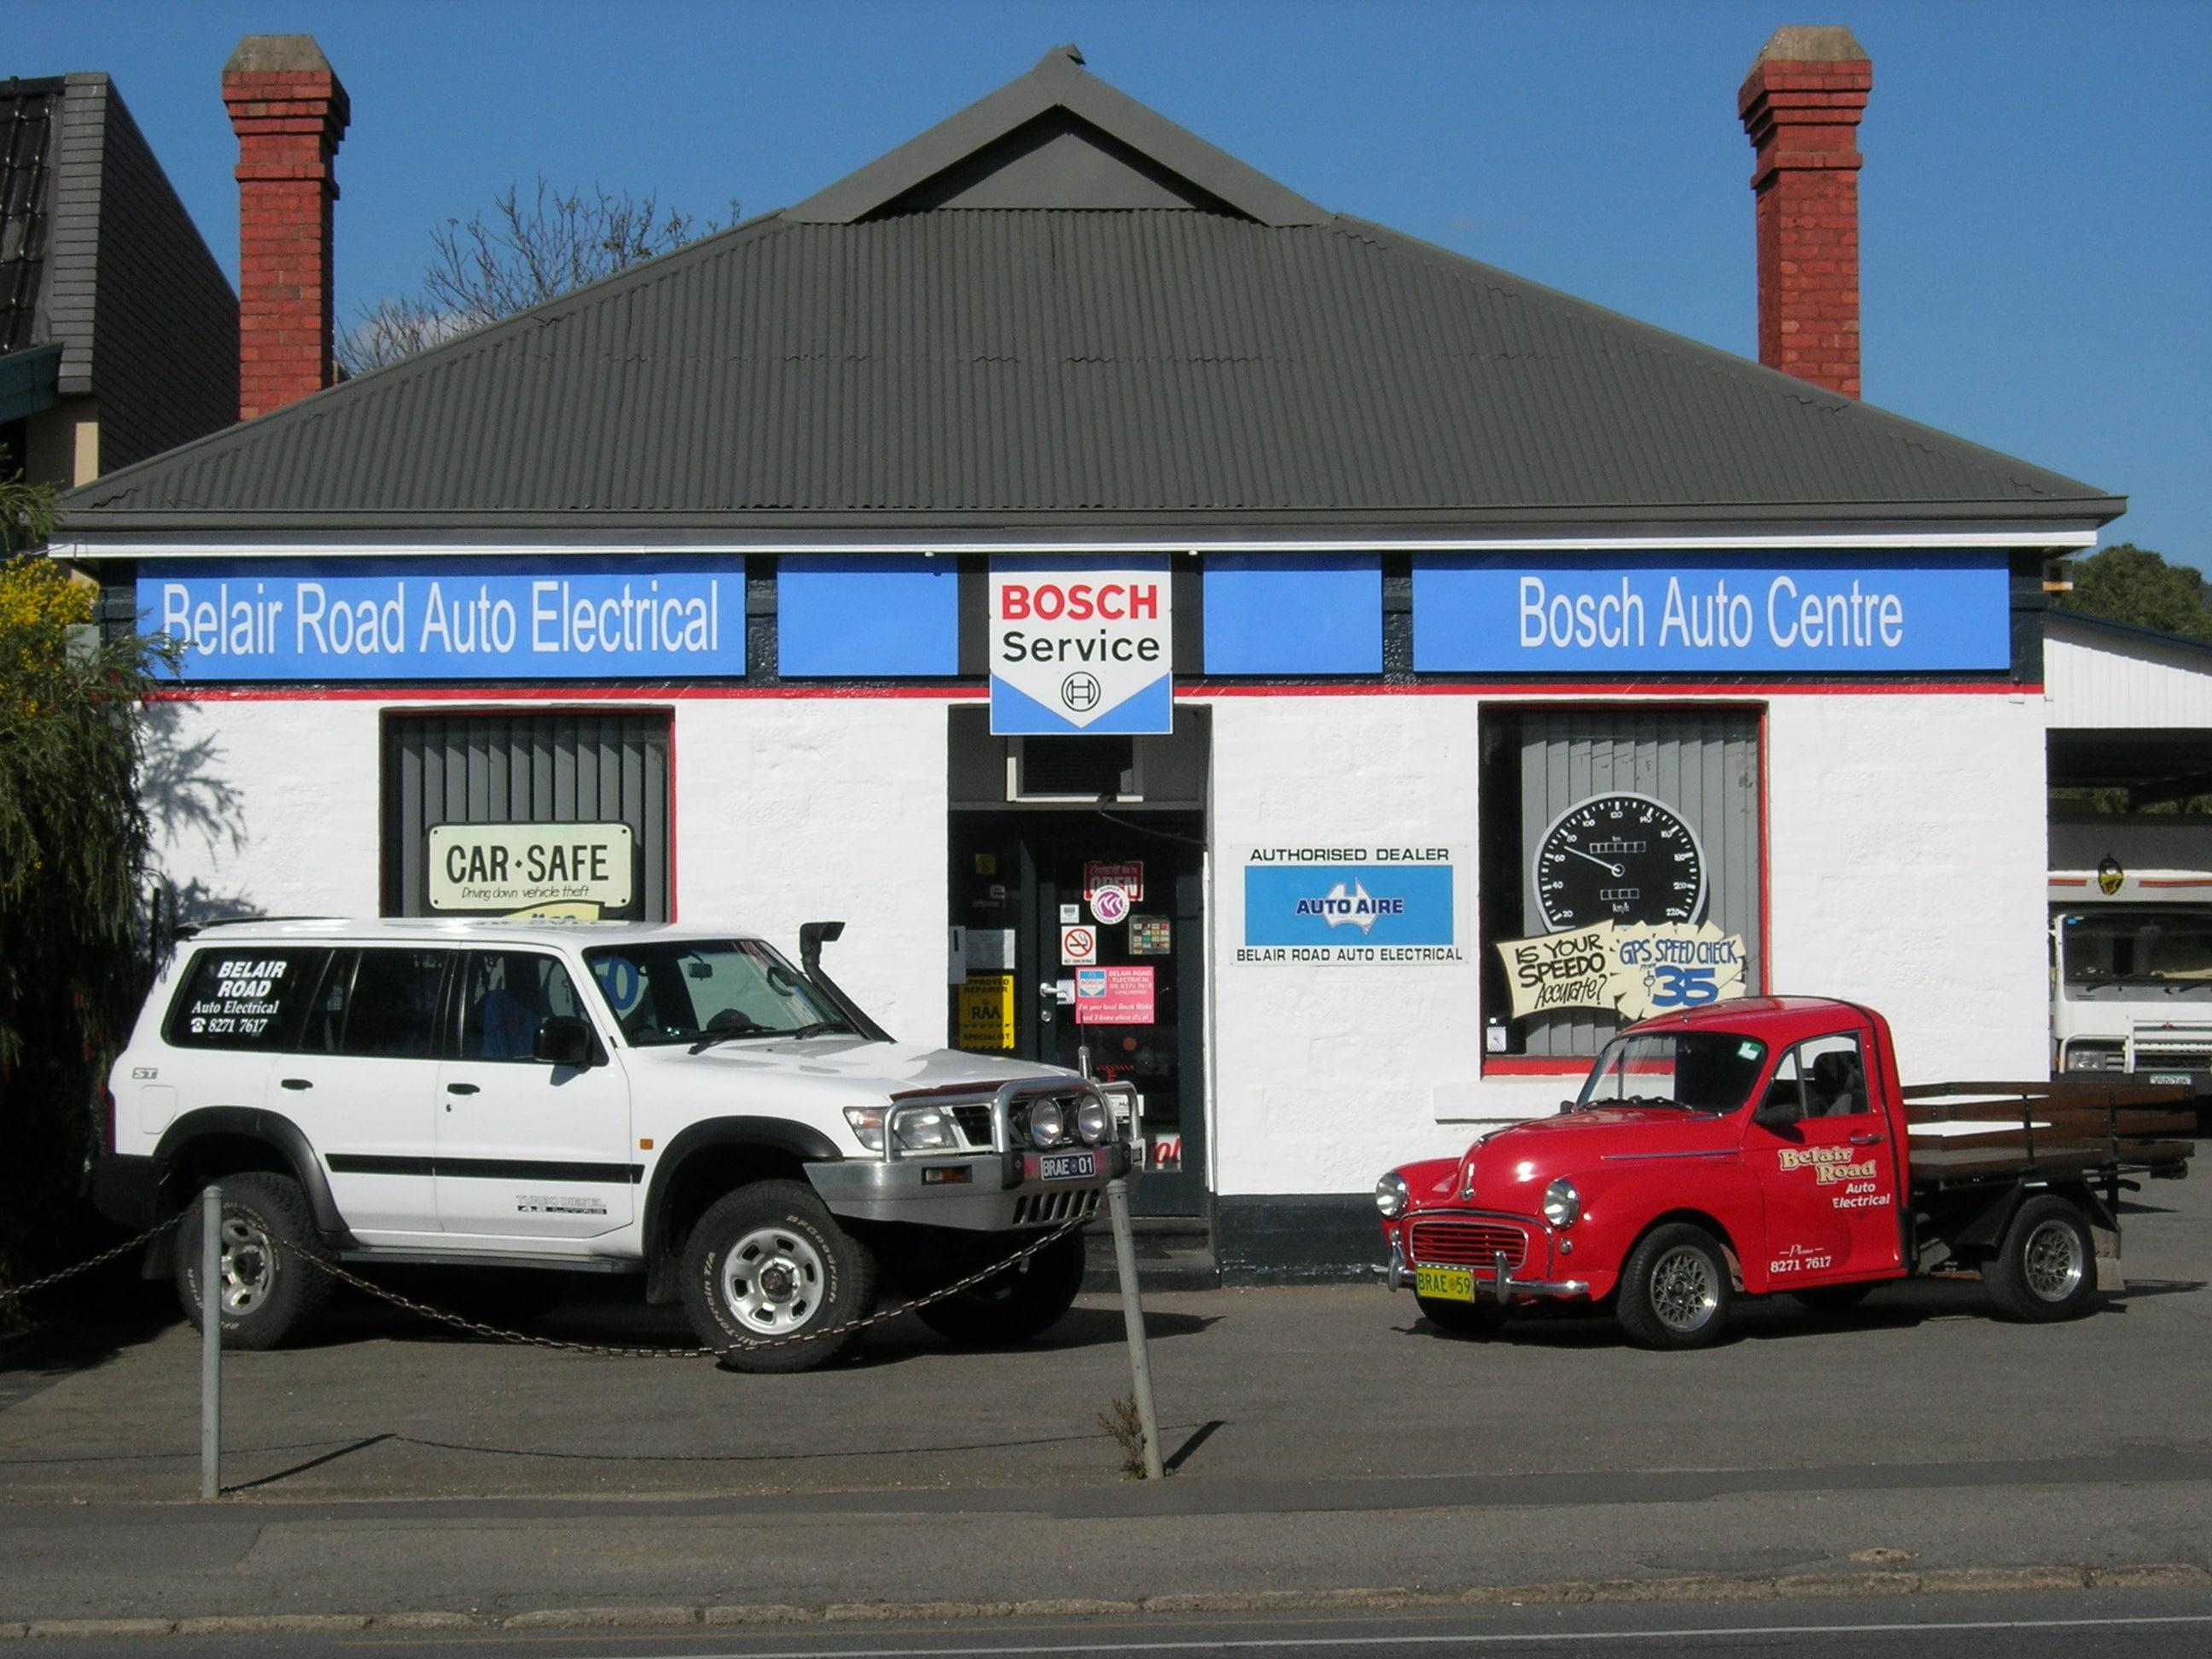 Belair Road Auto Electrical - Mechanics & Motor Engineers